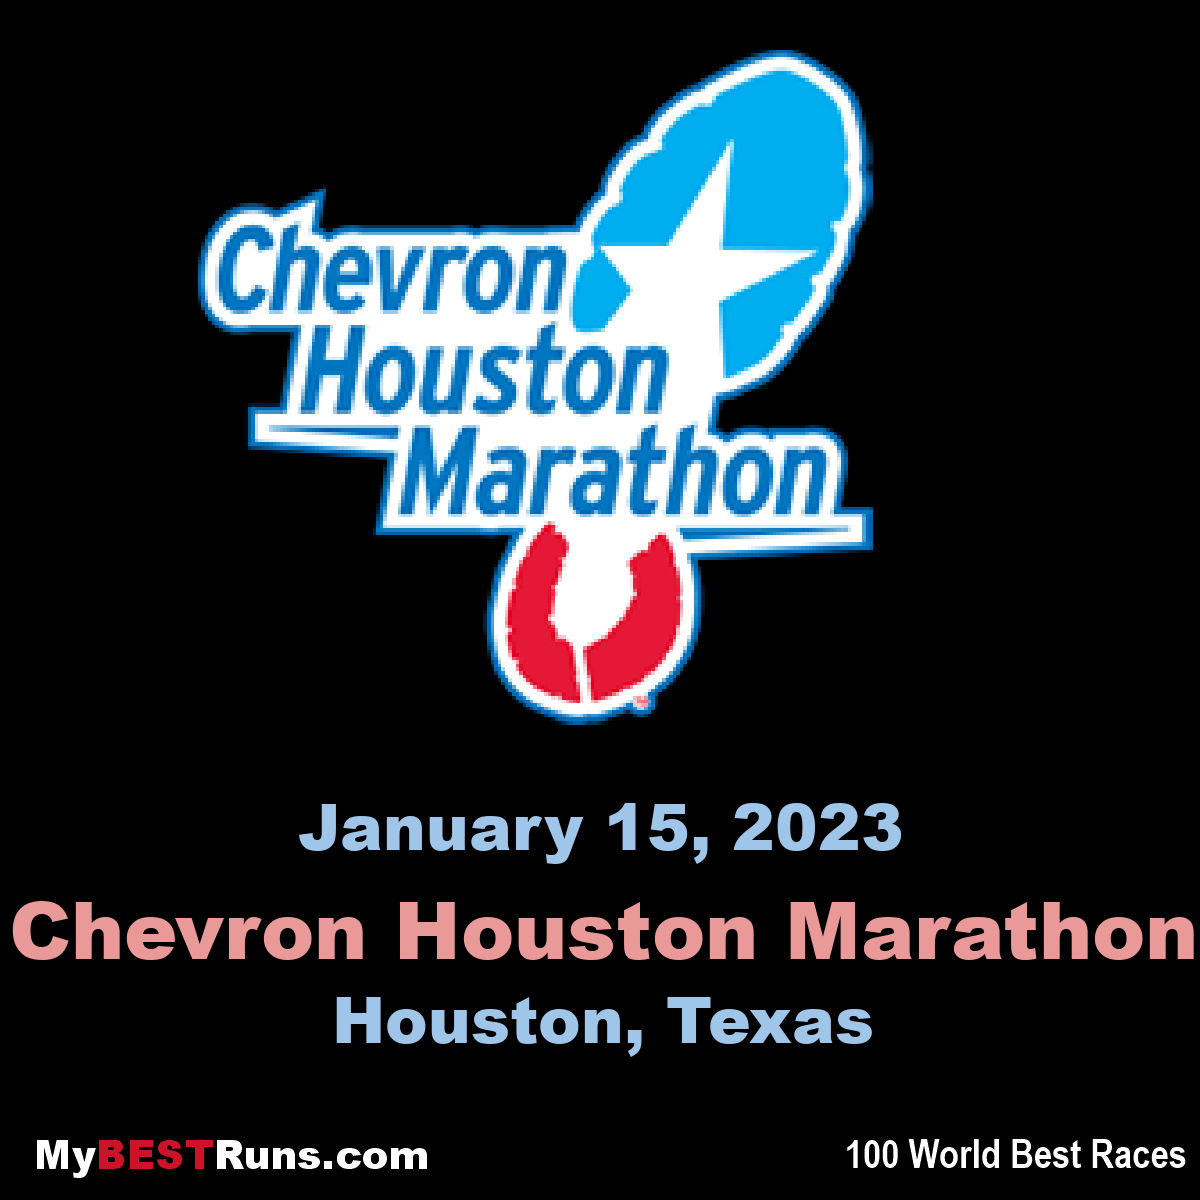 Chevron Houston Marathon Houston Texas 1202019 My BEST